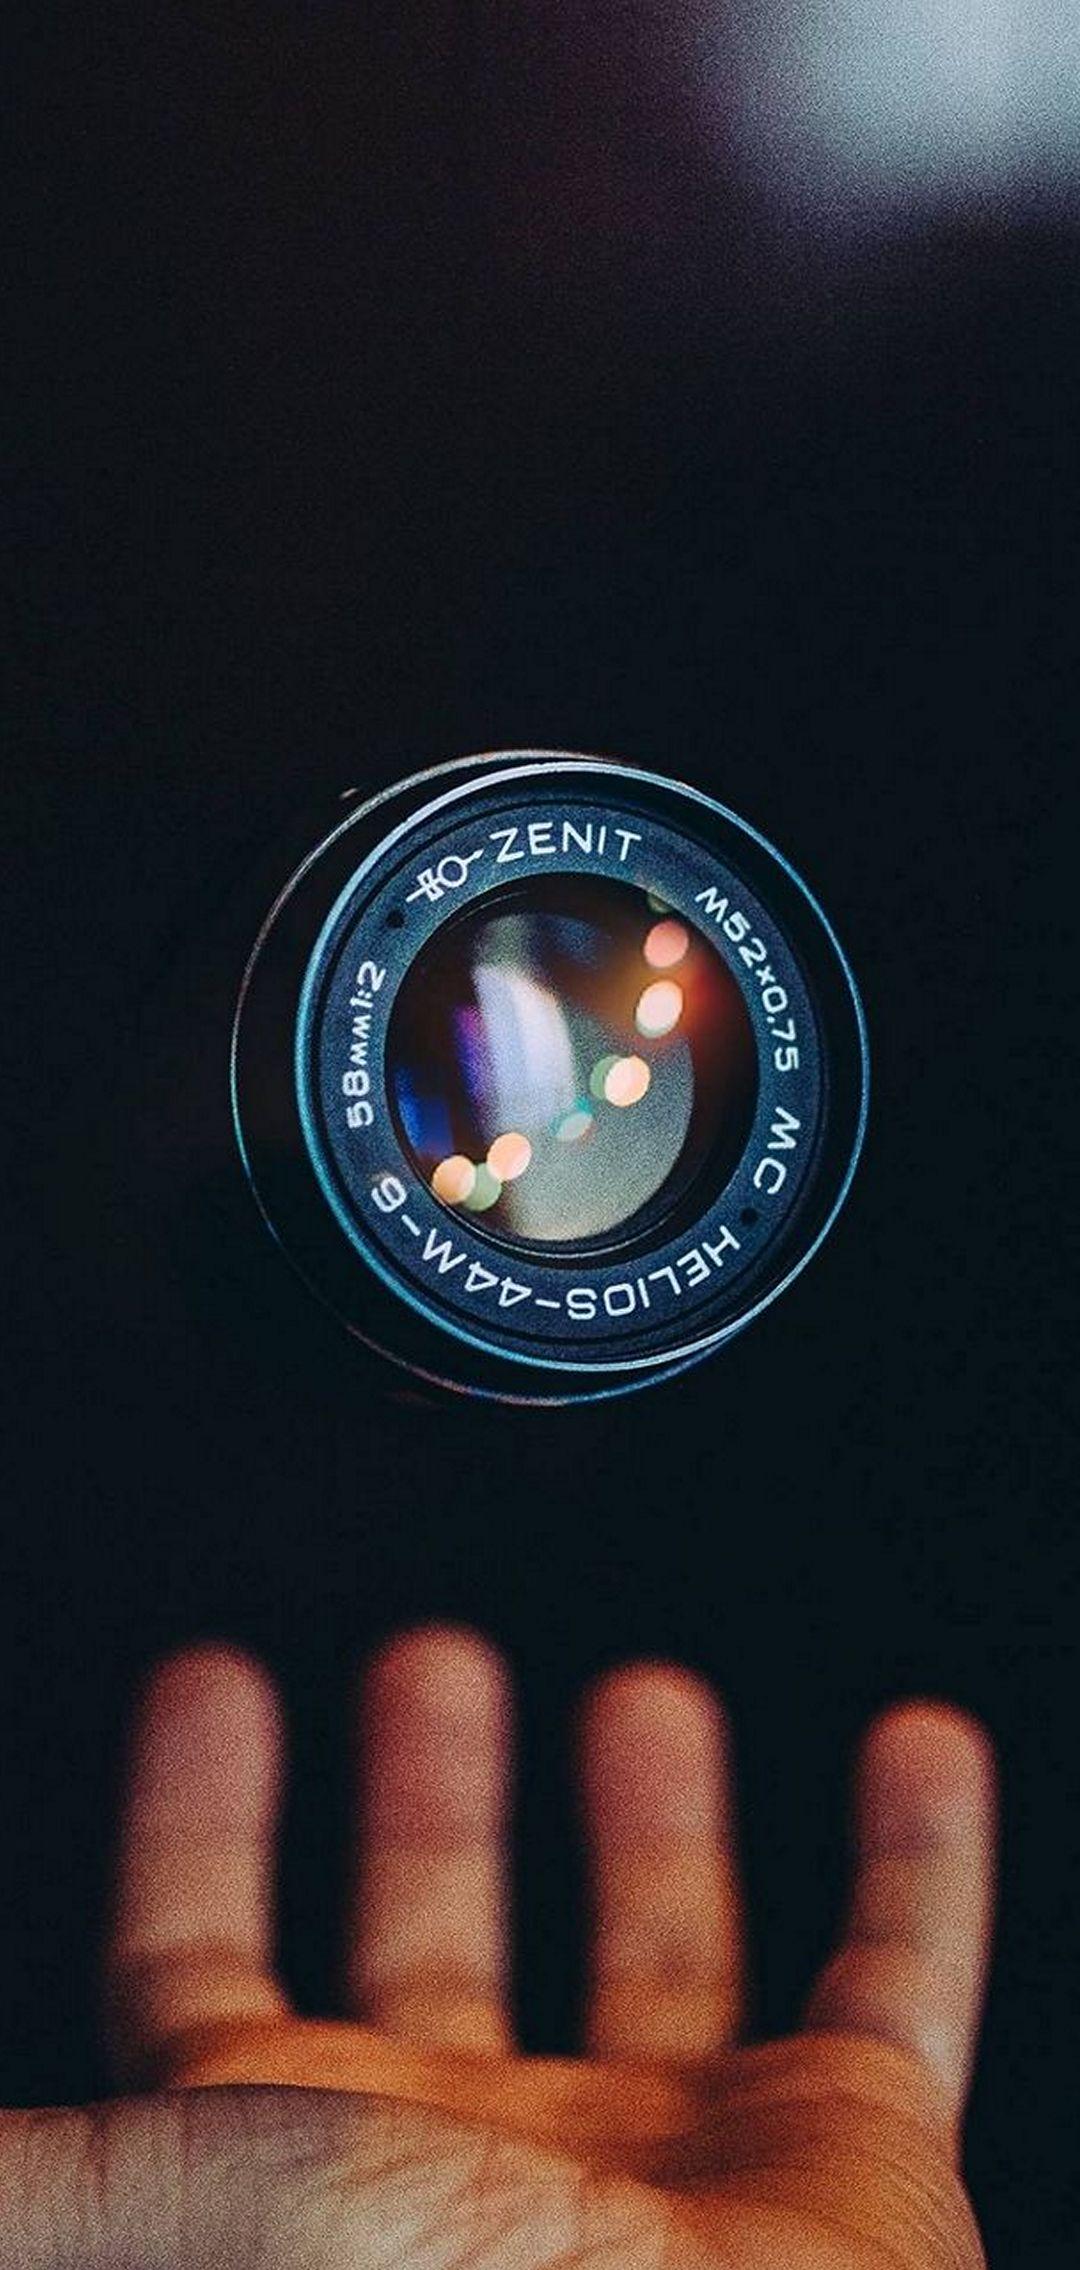 Lens Hand Camera Technology